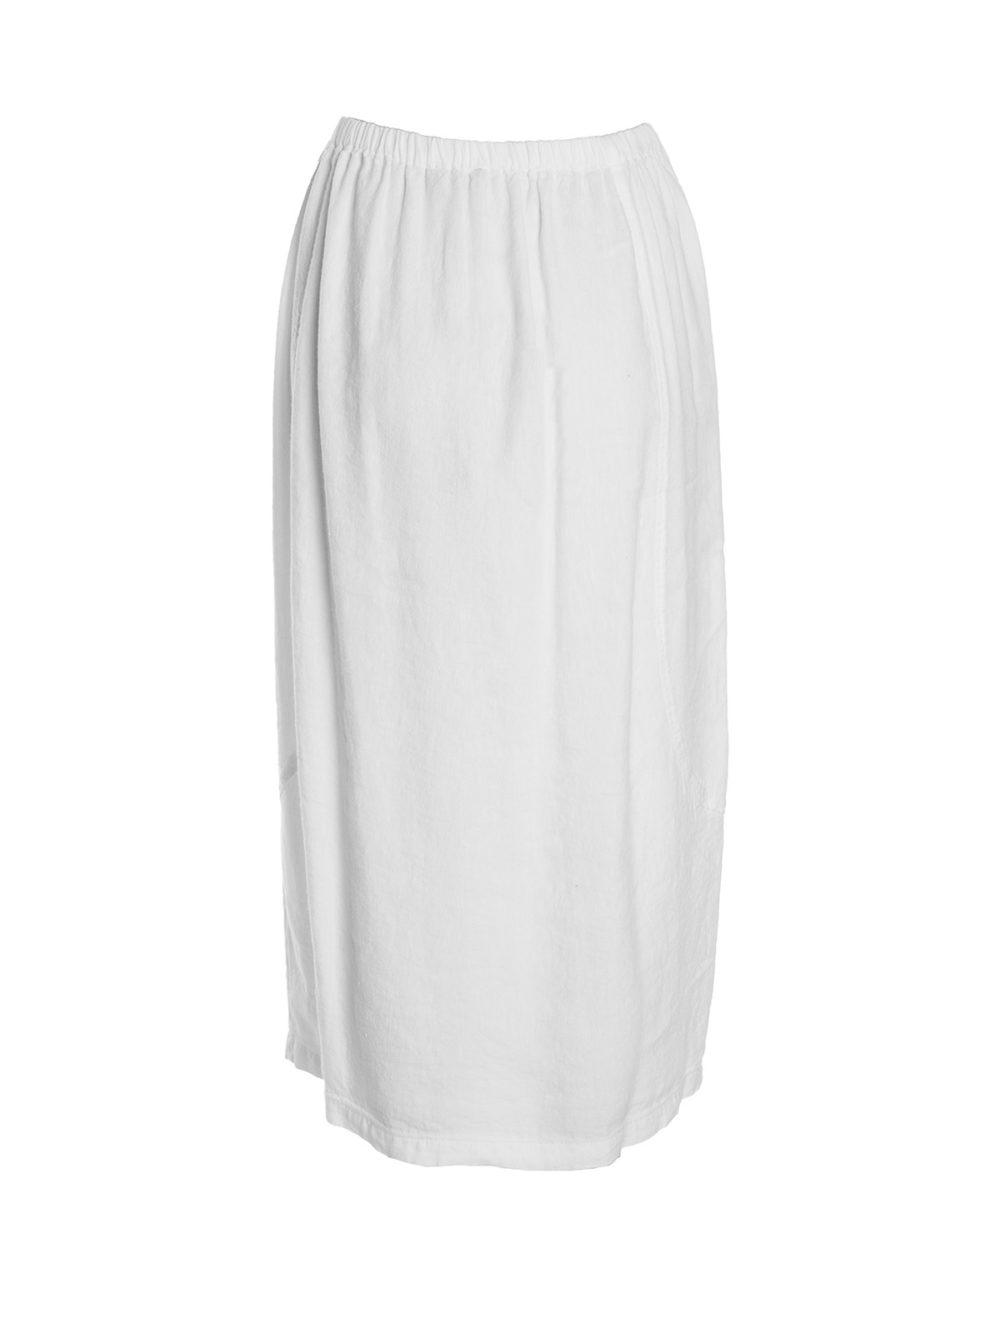 Textured Linen Bubble Skirt Sahara Katie Kerr Women's Clothing